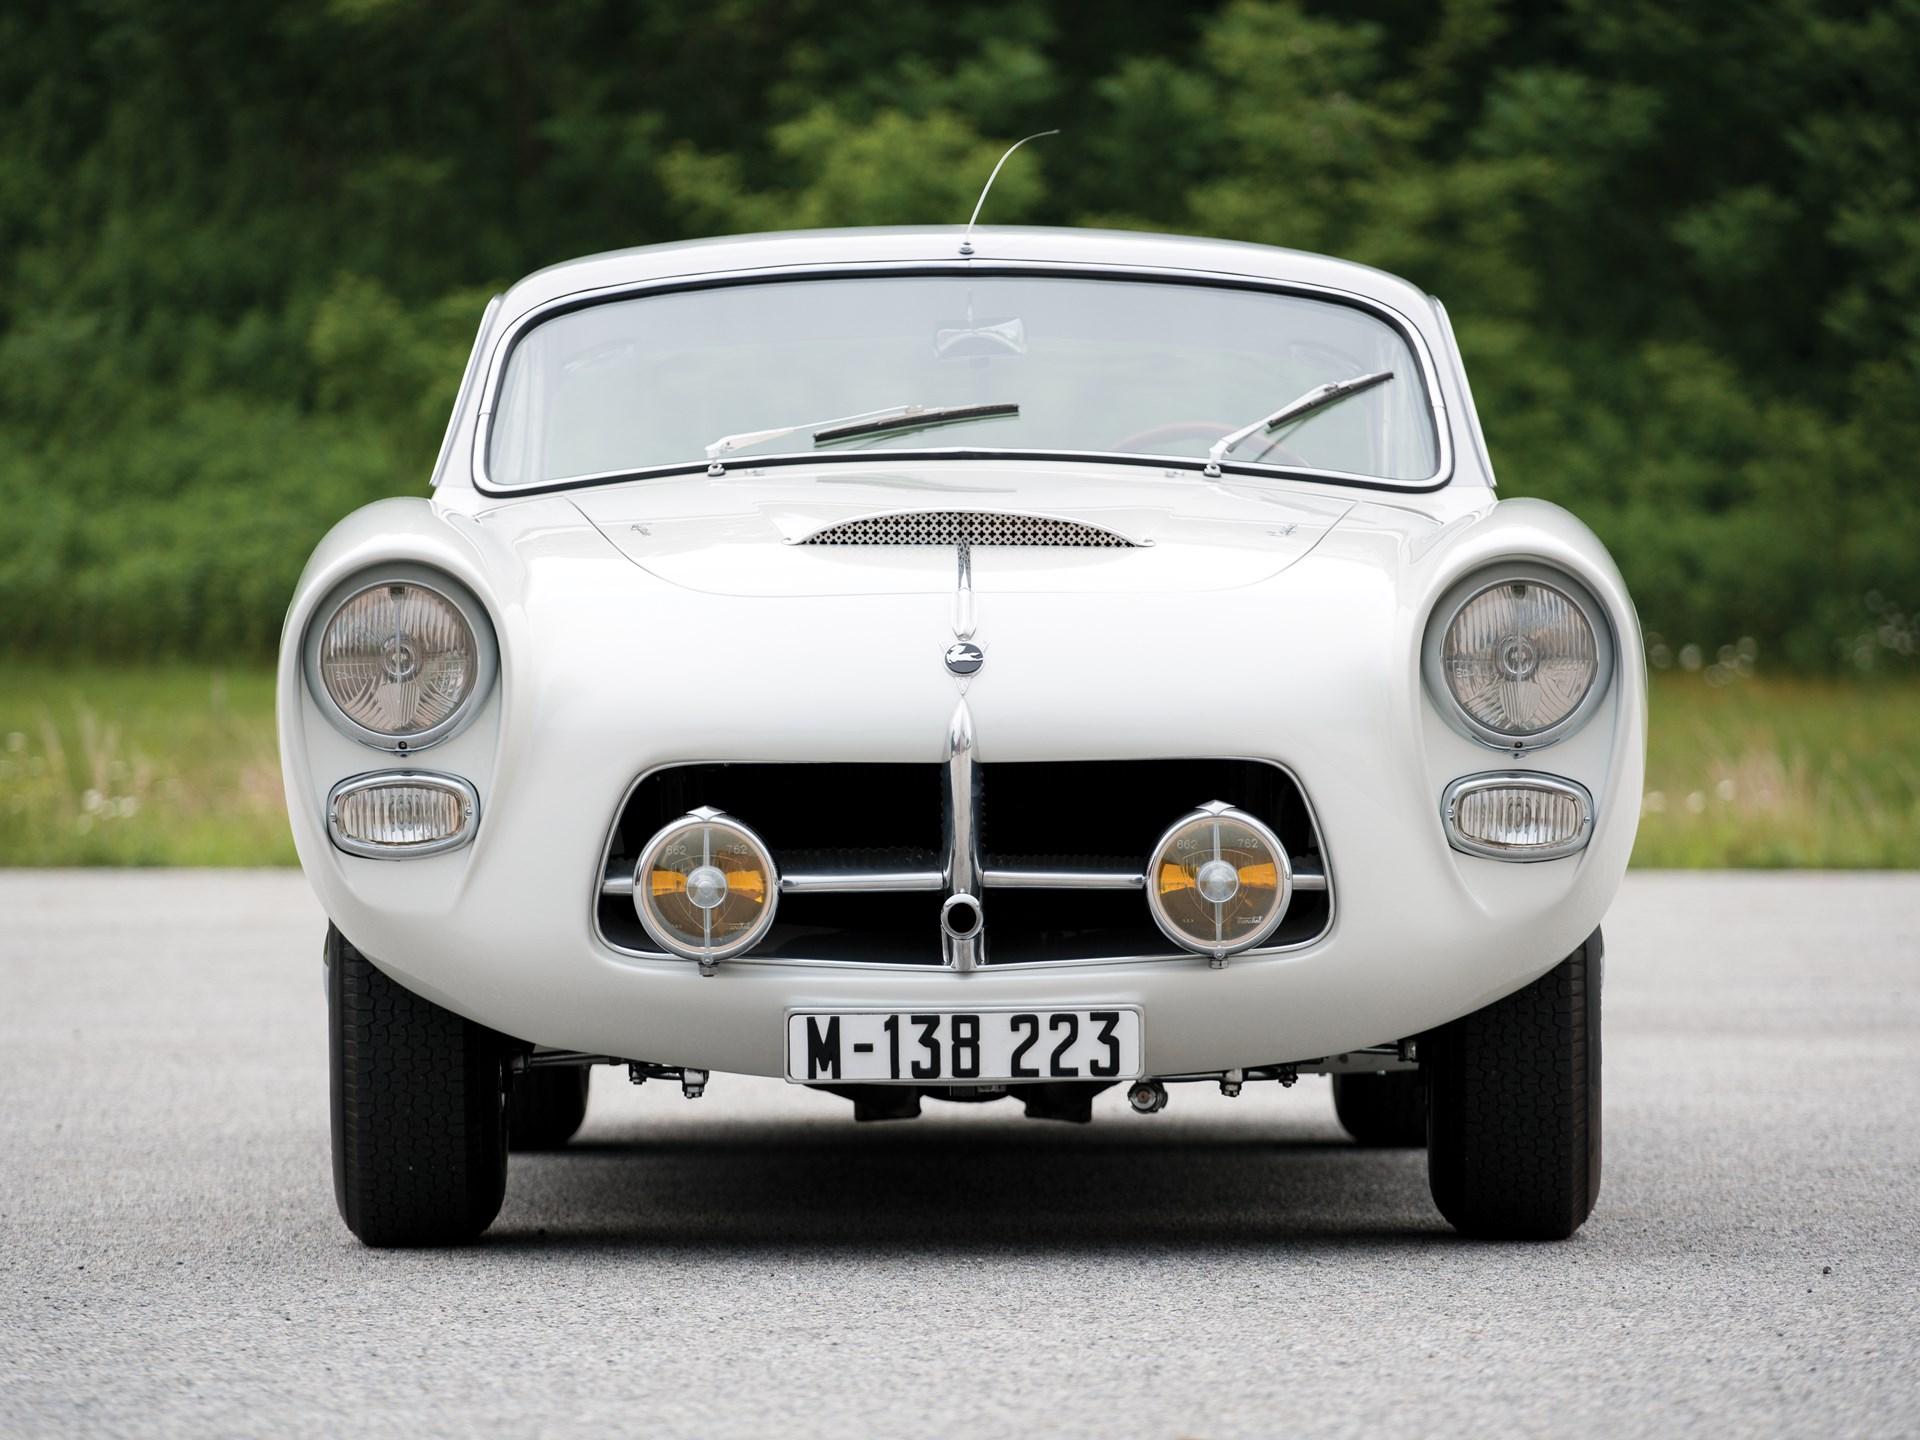 1954 Pegaso Z-102 Berlinetta Series II by Saoutchik